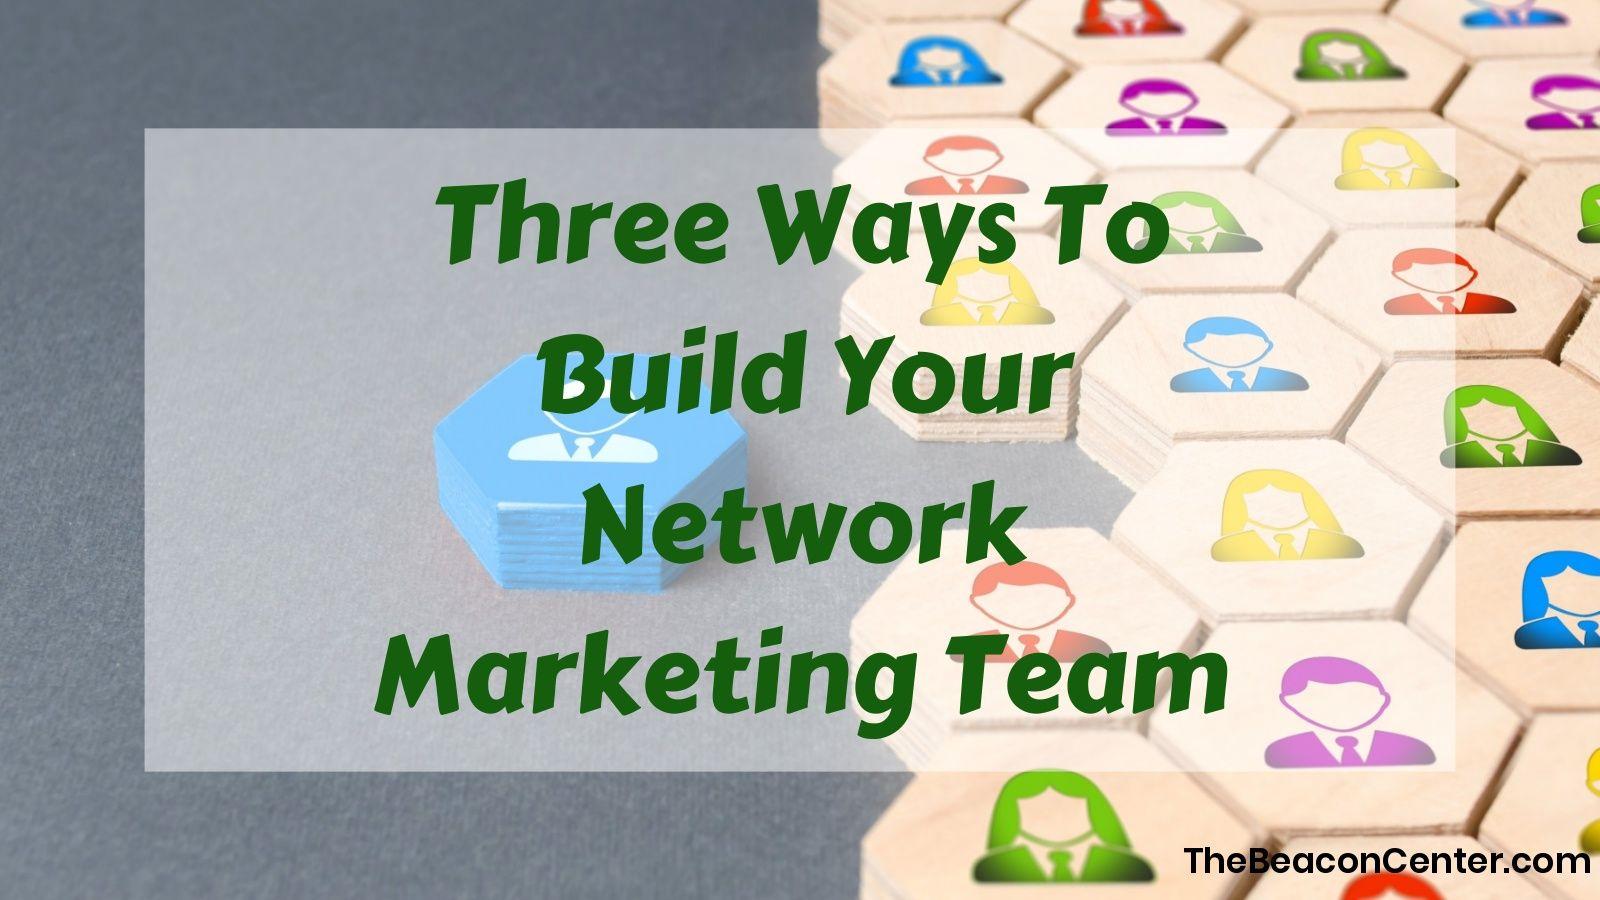 Network Marketing Team Photo